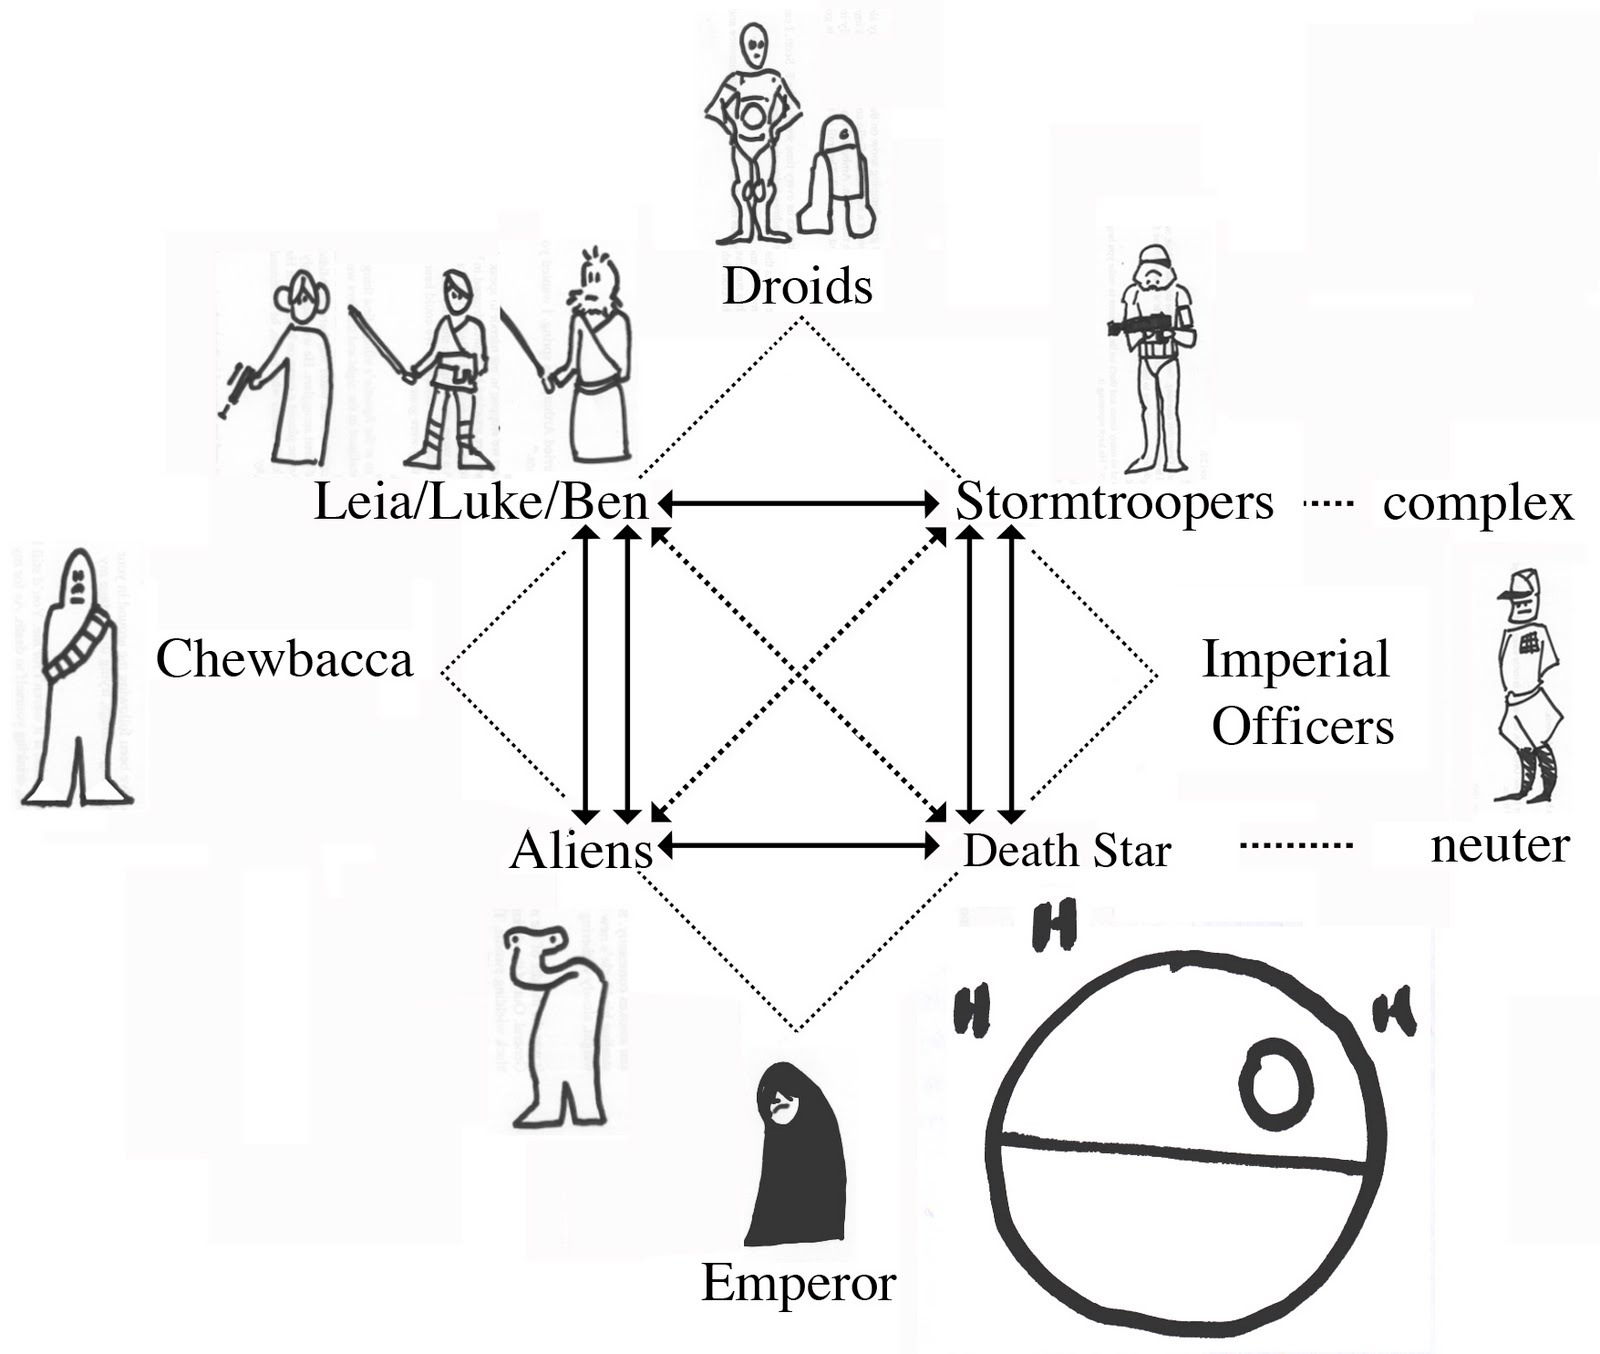 Star Wars Modern Star Wars Highbrow Thesis Antithesis